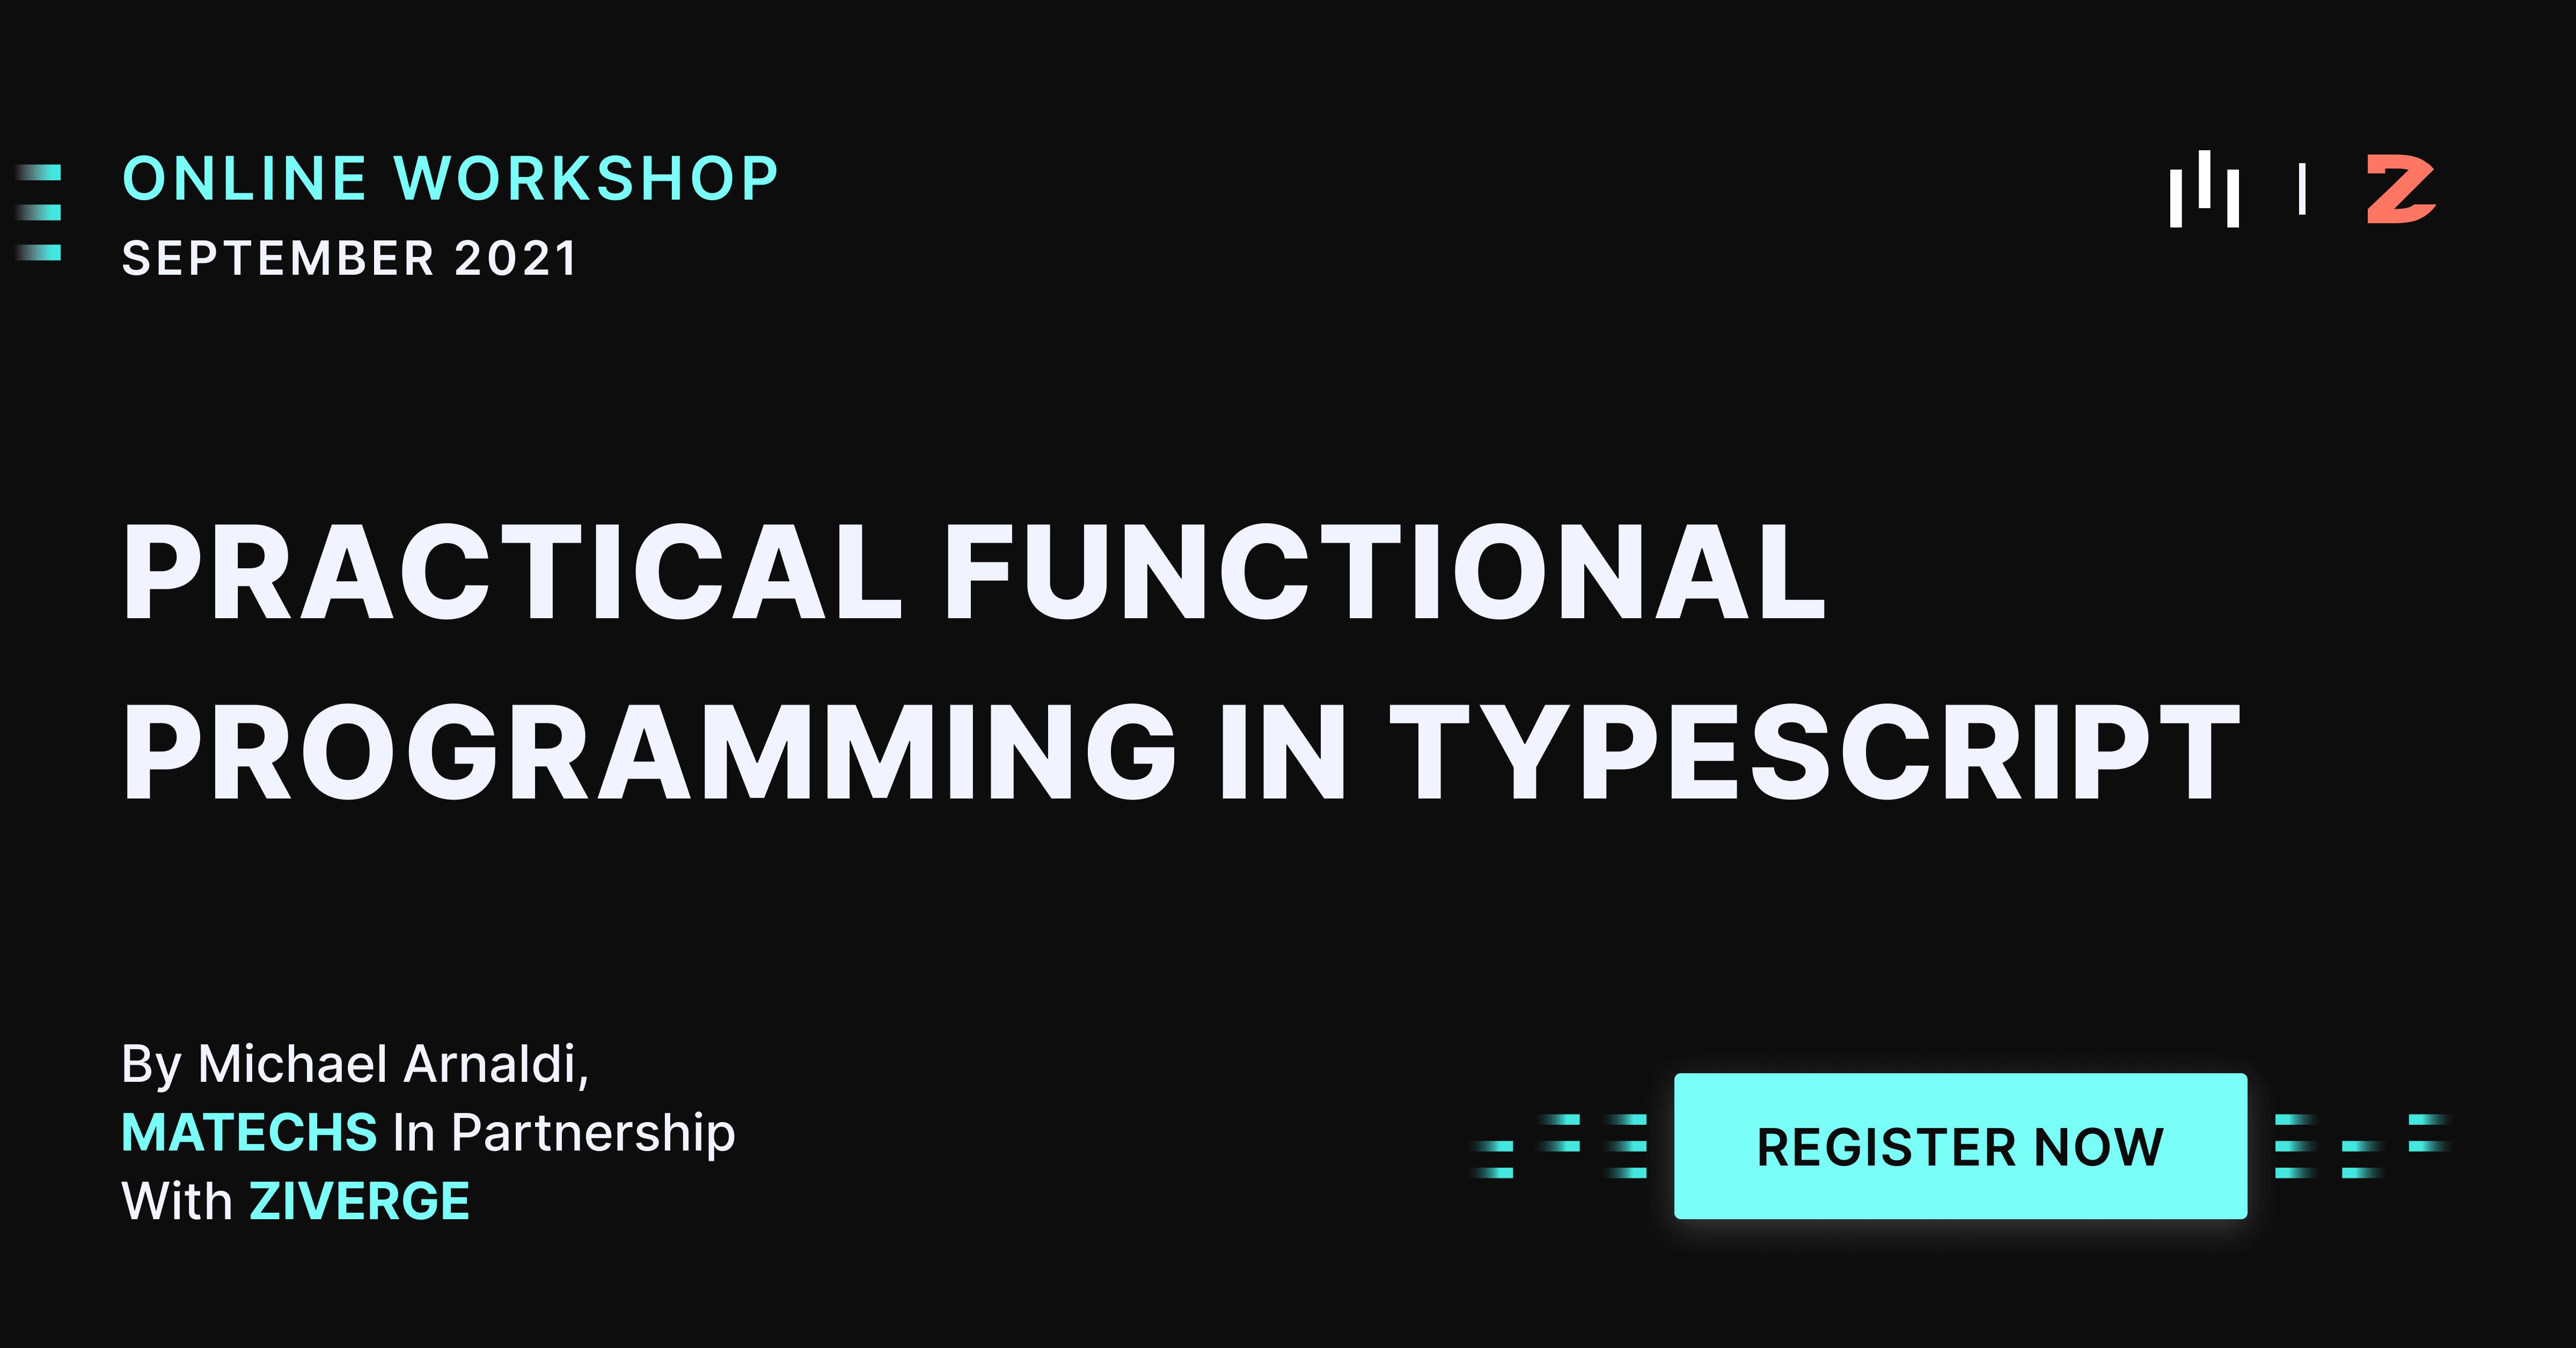 Practical Functional Programming in Typescript - Sept 2021